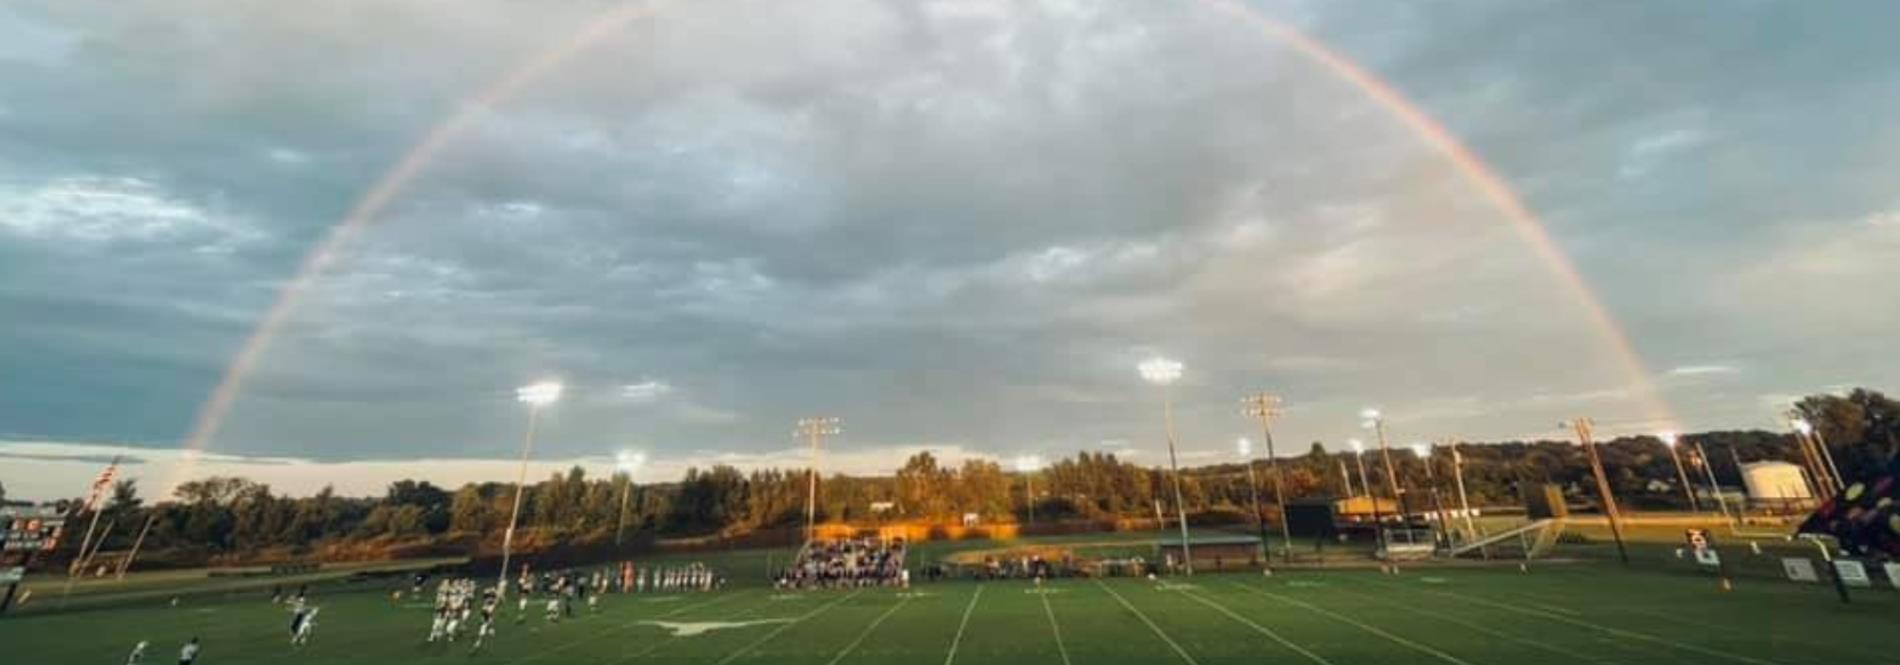 rainbow at football